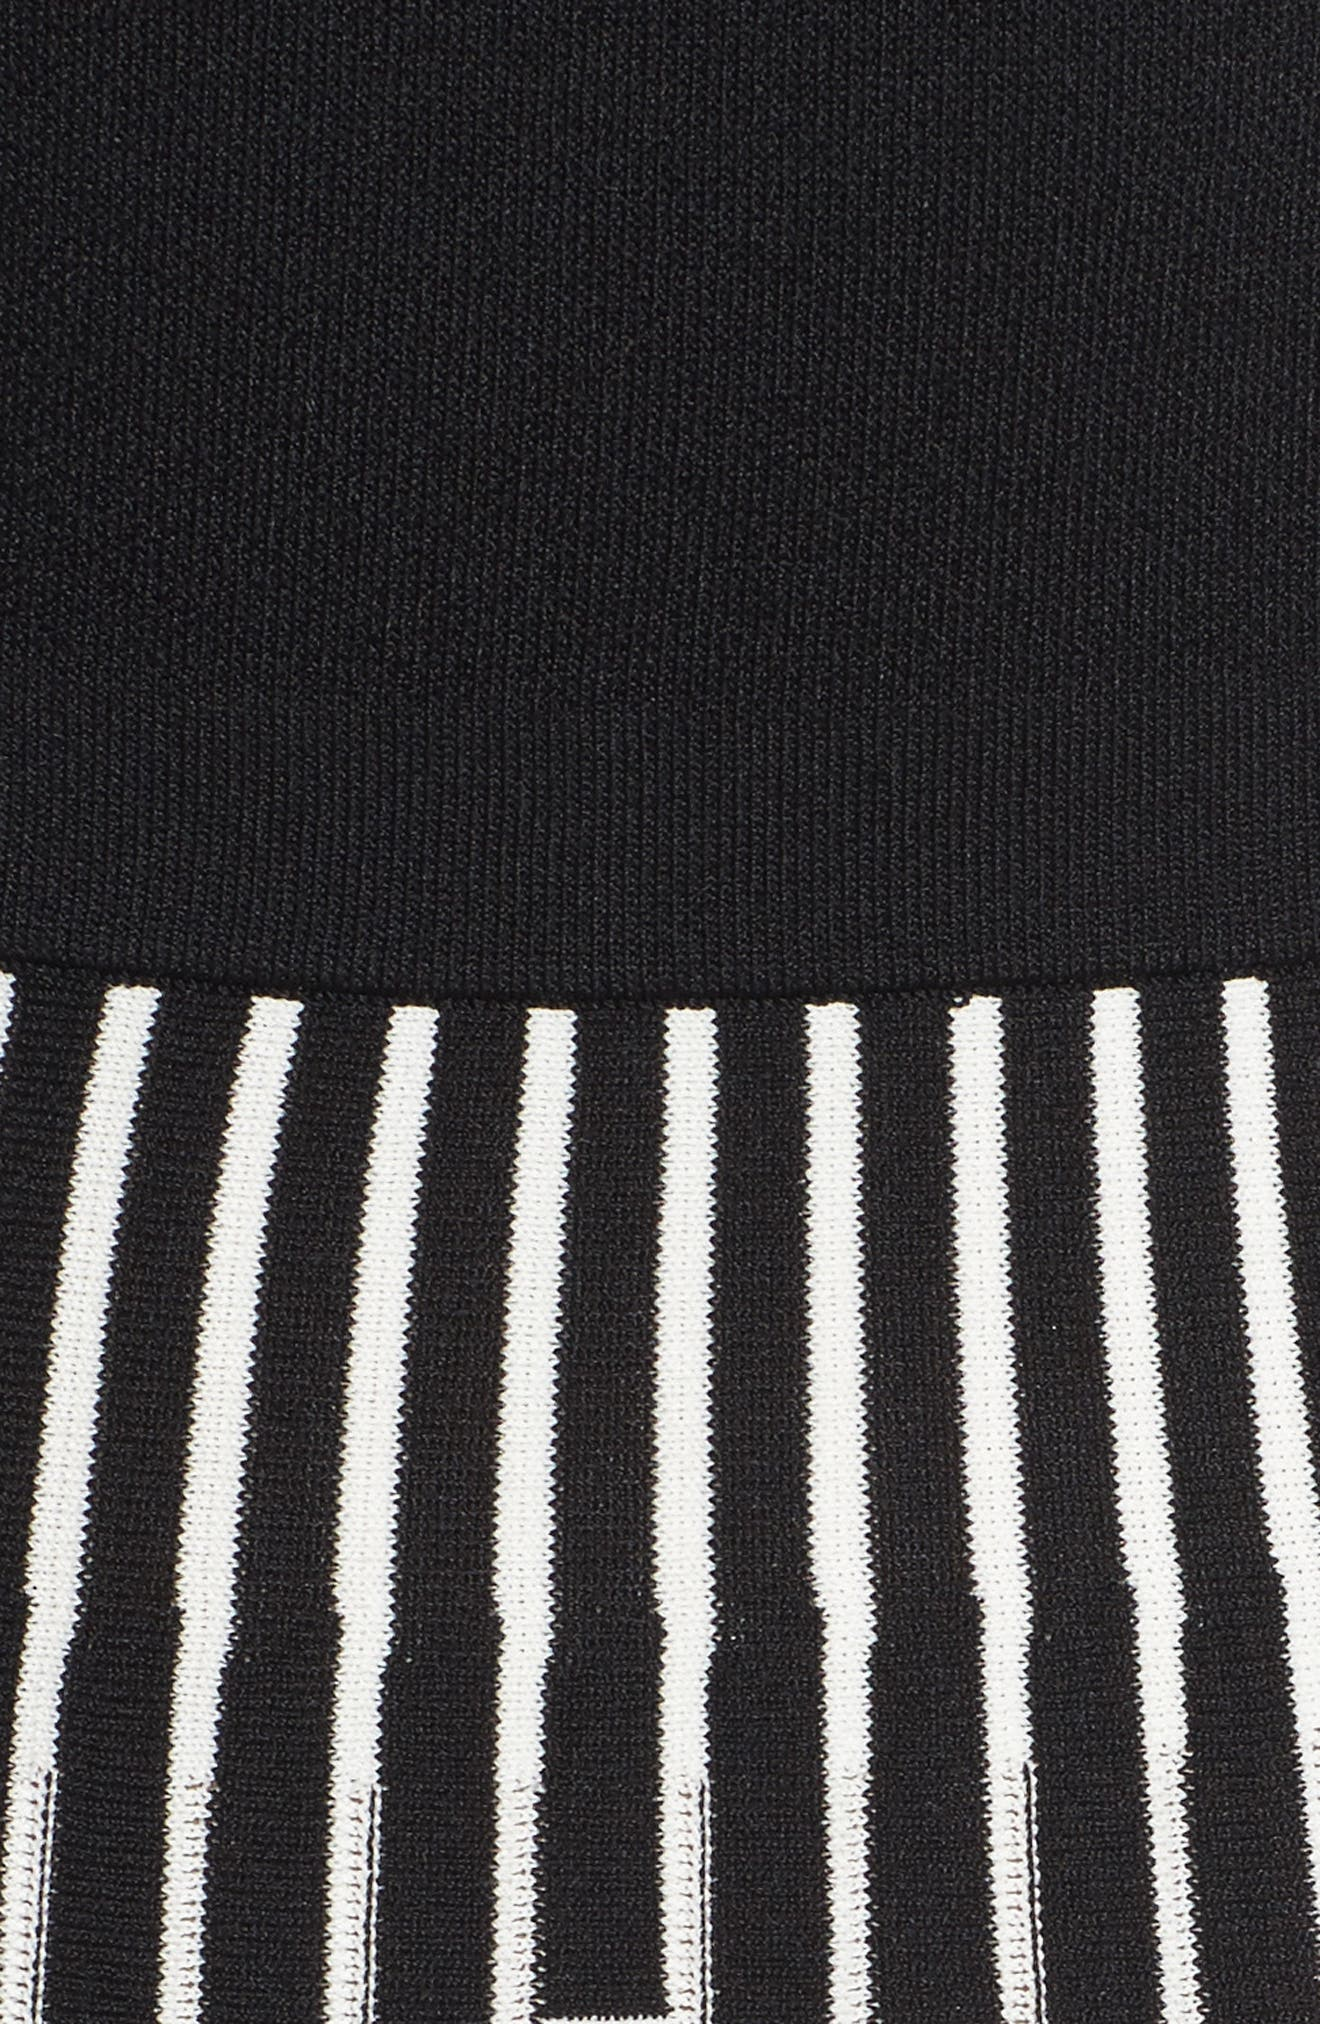 Off the Shoulder Midi Dress,                             Alternate thumbnail 5, color,                             BLACK/ IVORY